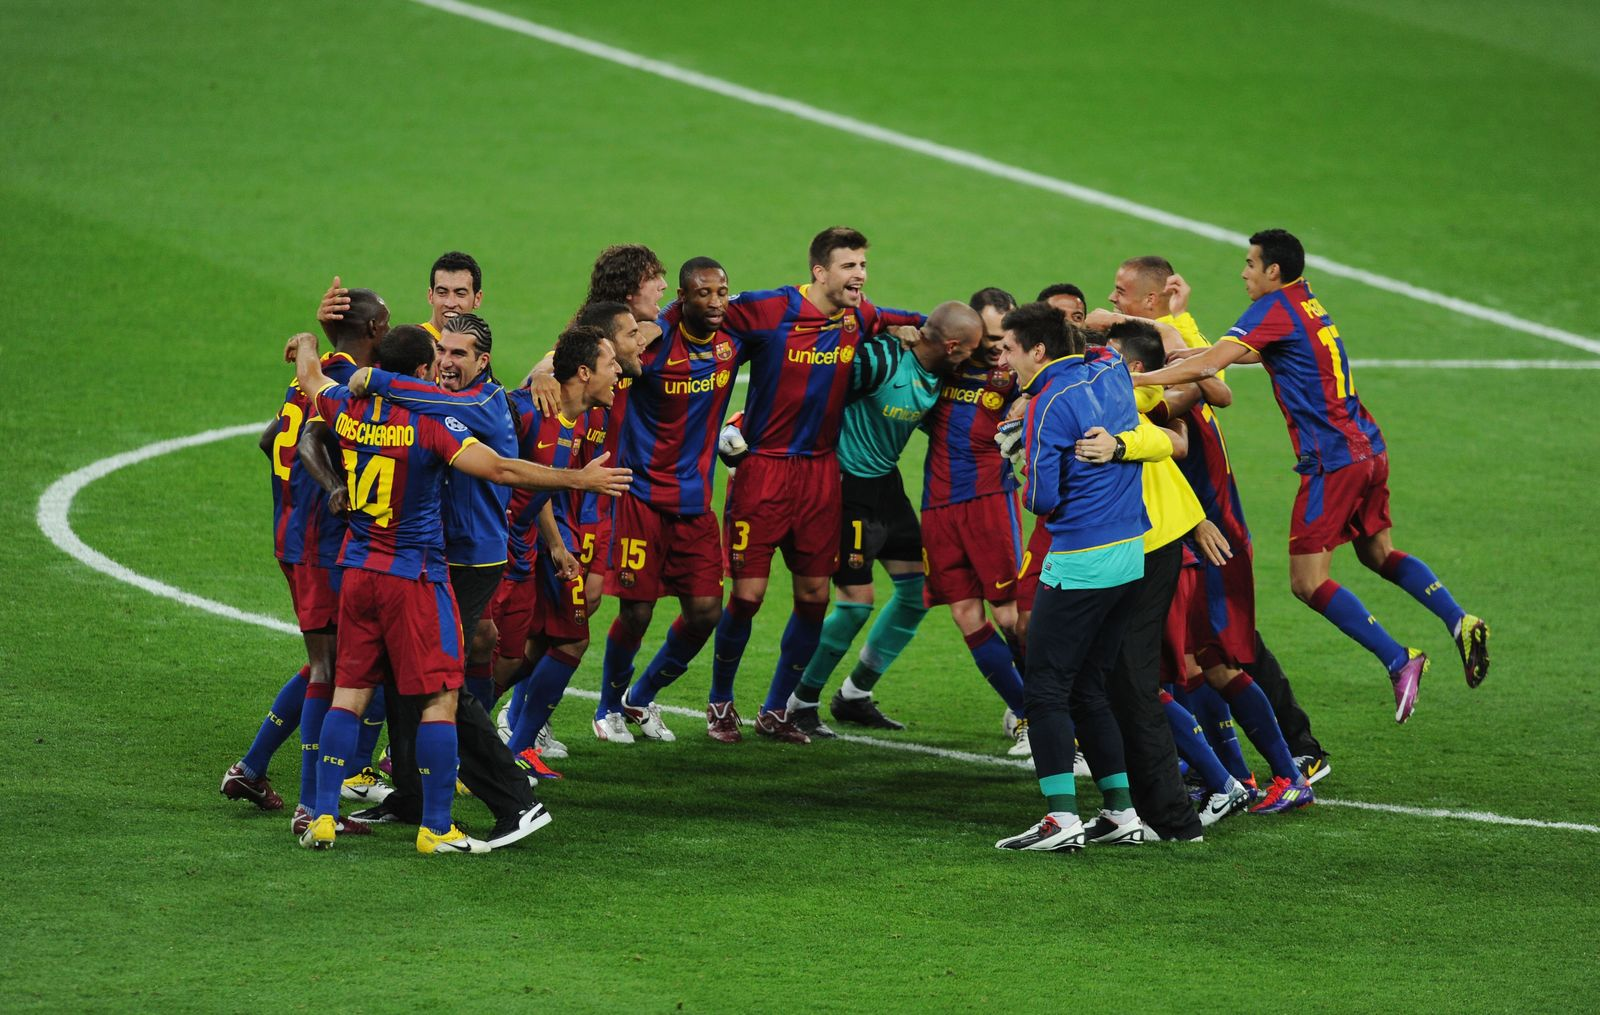 FC Barcelona/Jubel